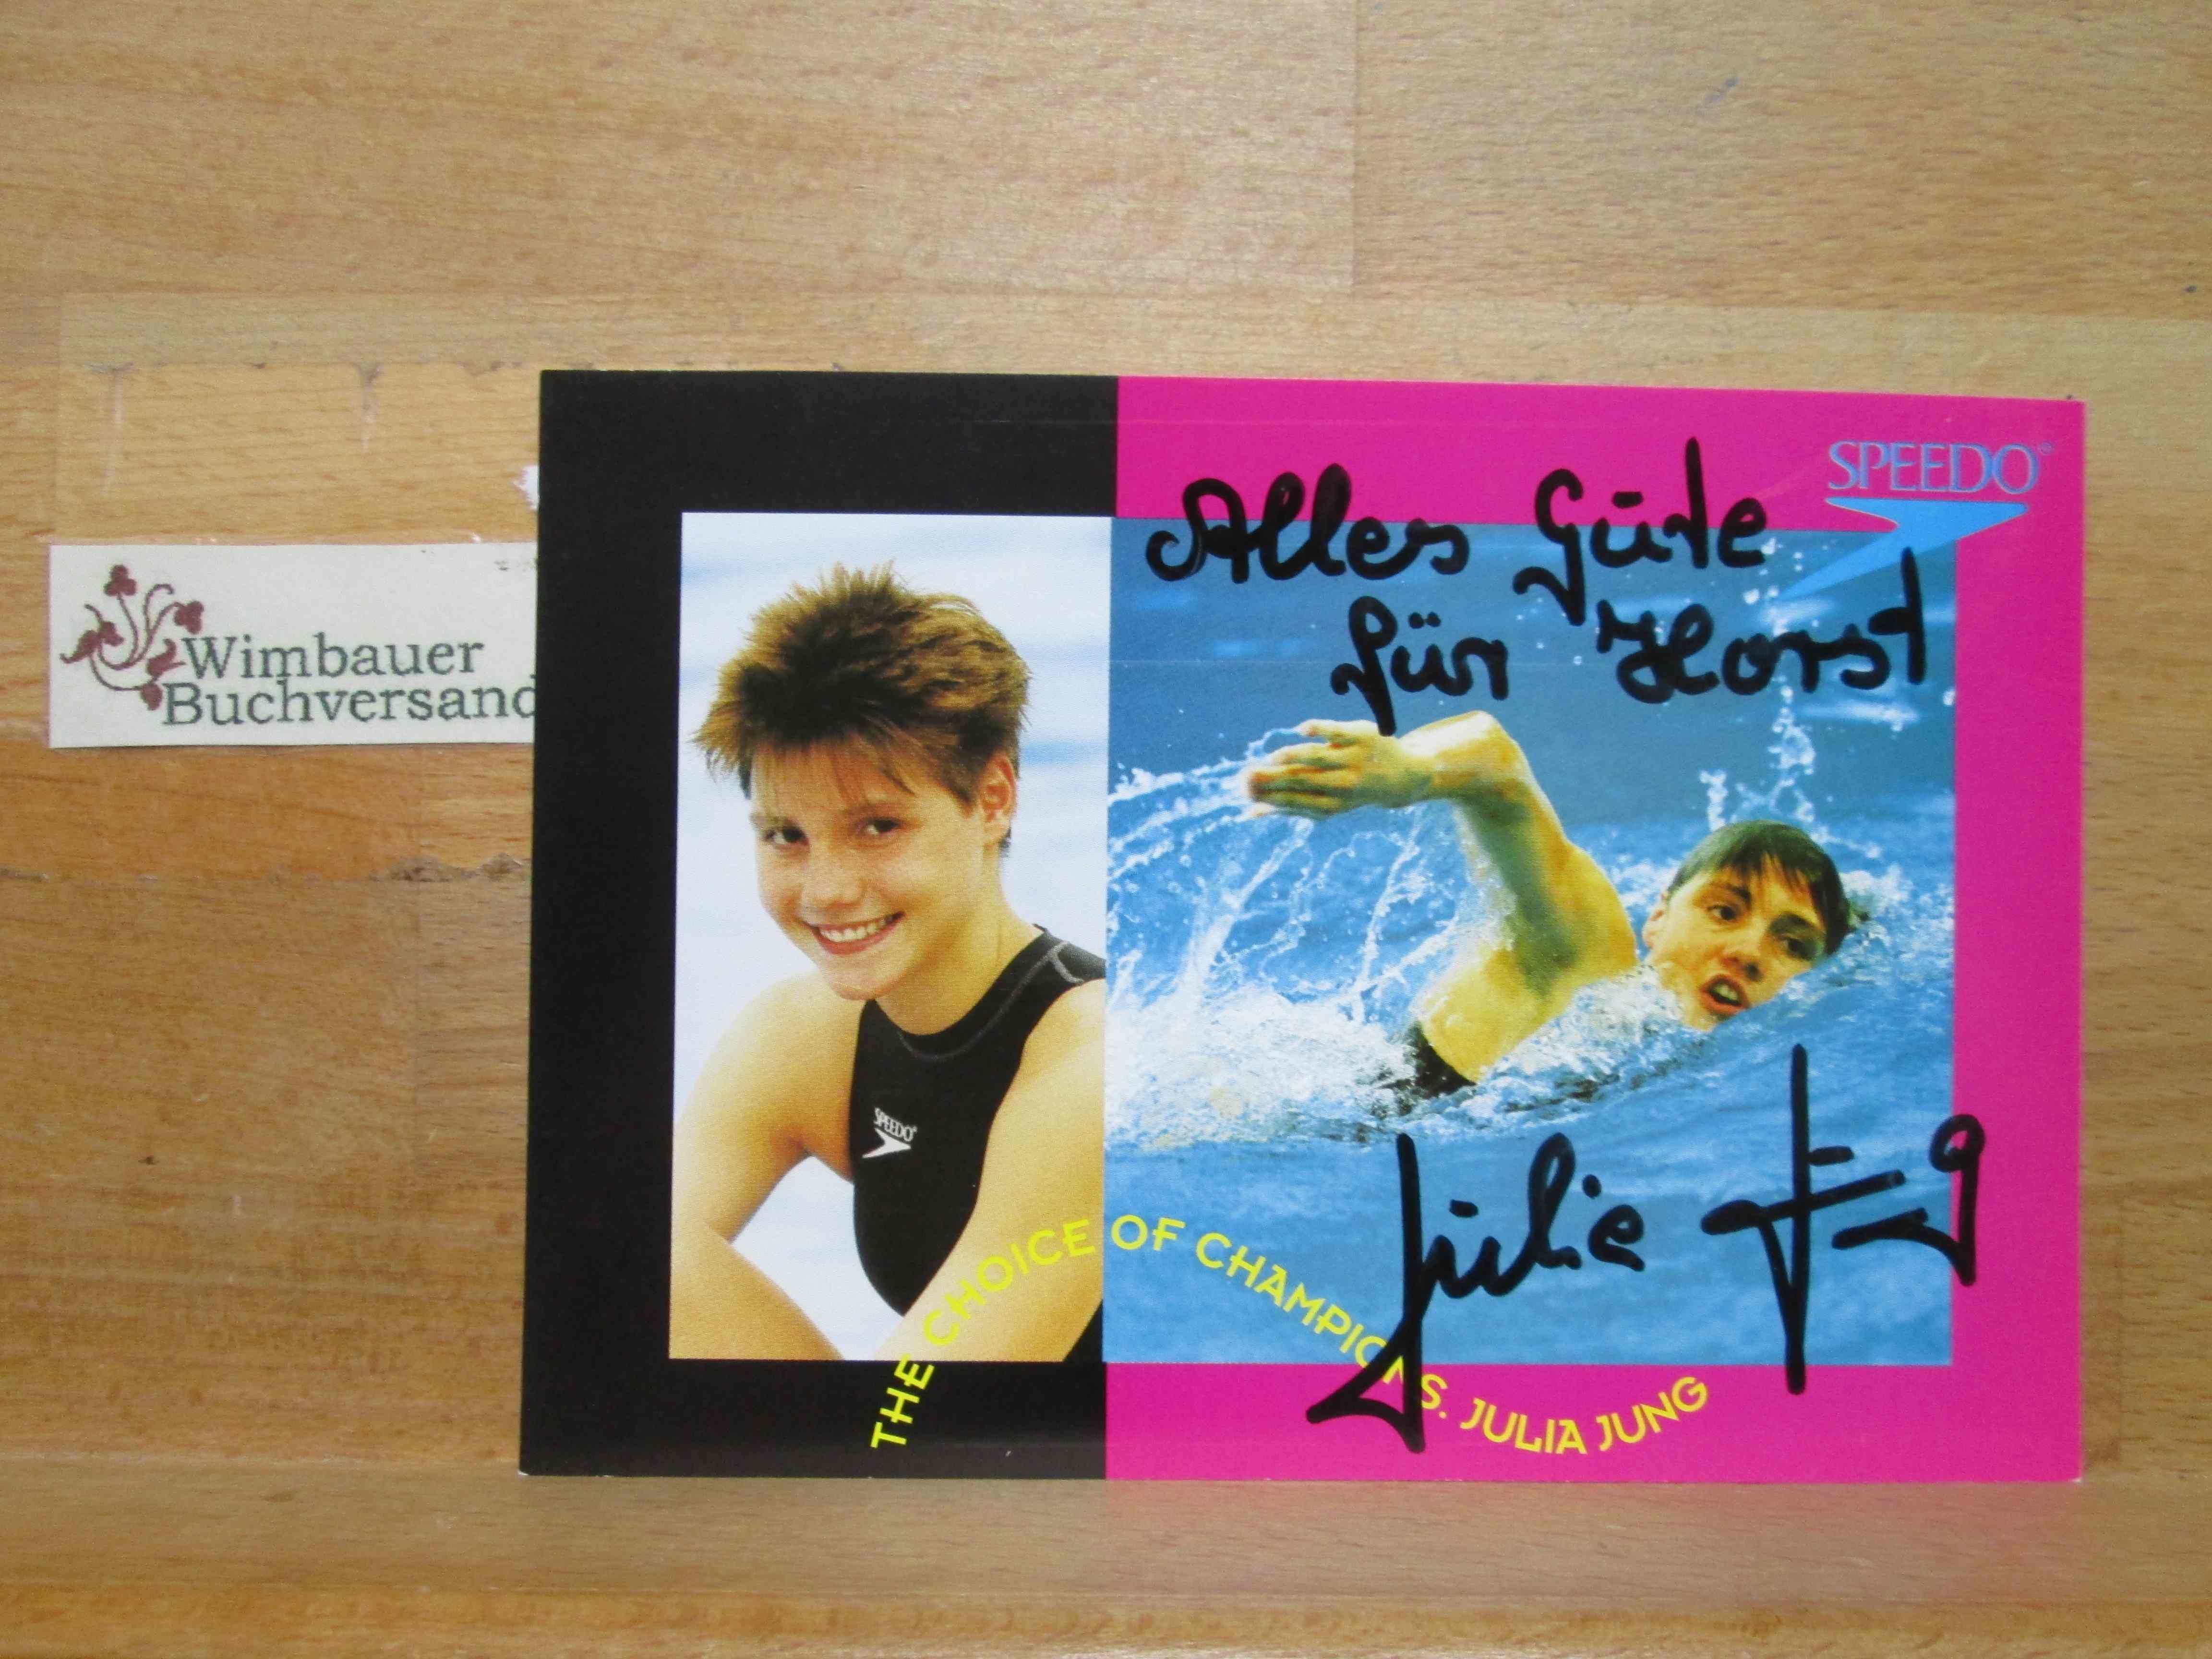 Original Autogramm Julia Jung Schwimmen /// Autogramm Autograph signiert signed signee